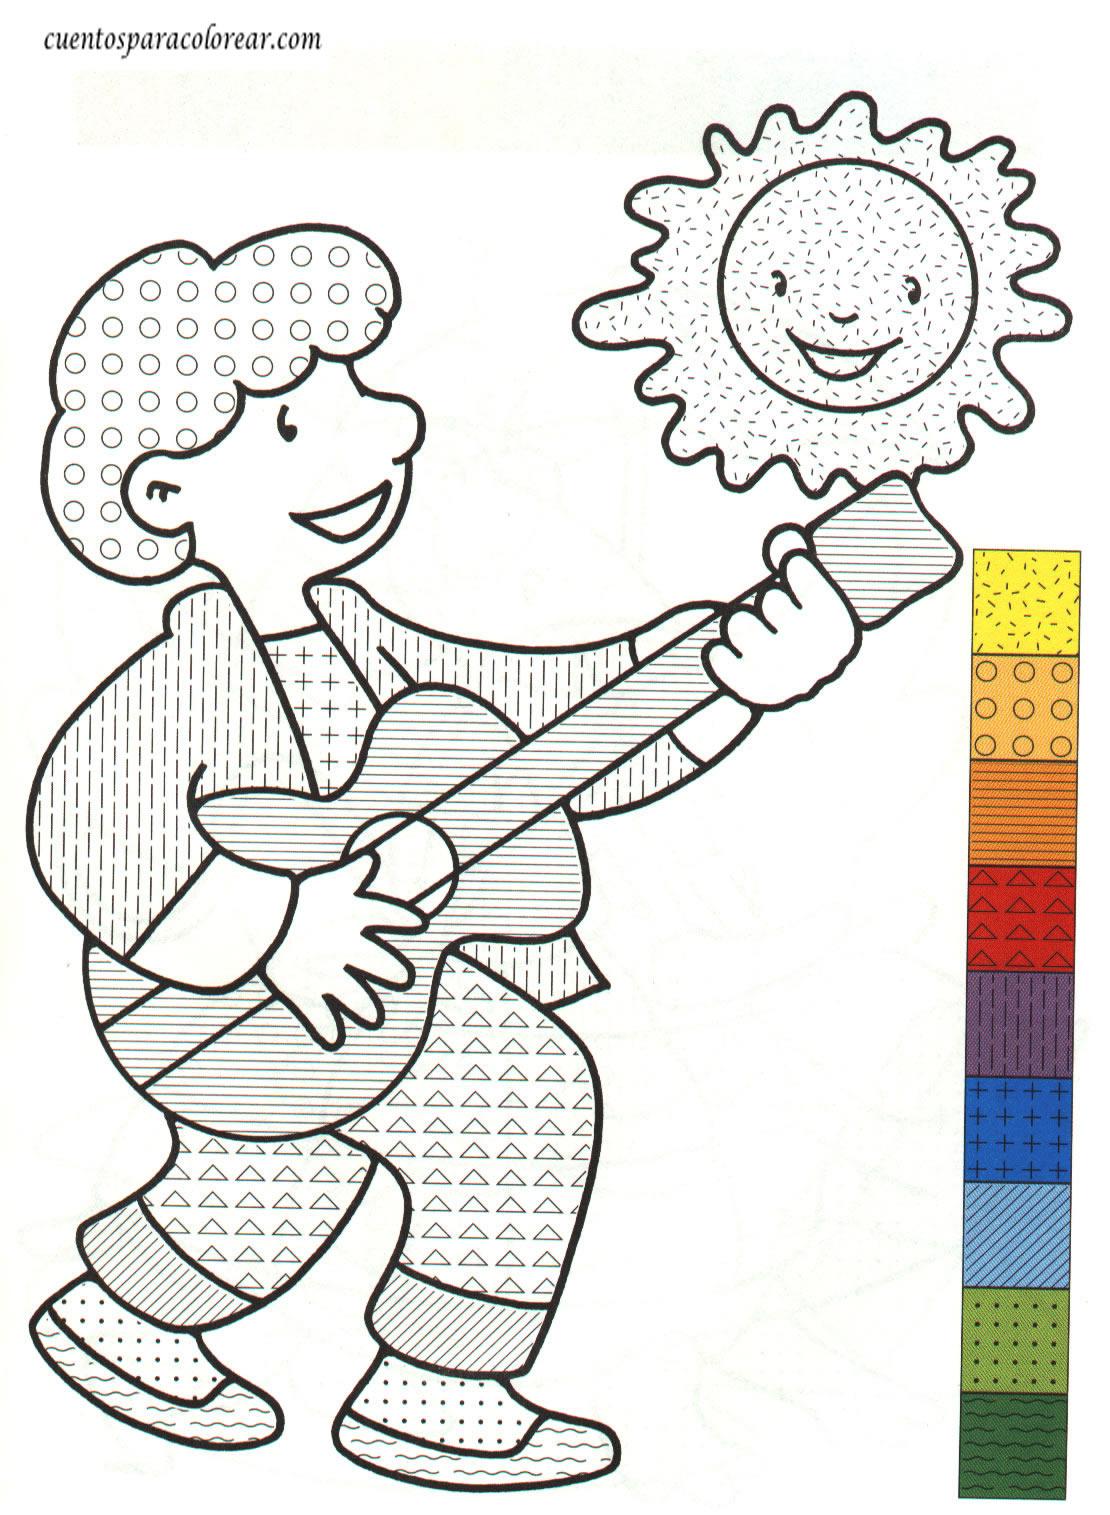 Dibujos para colorear detalles